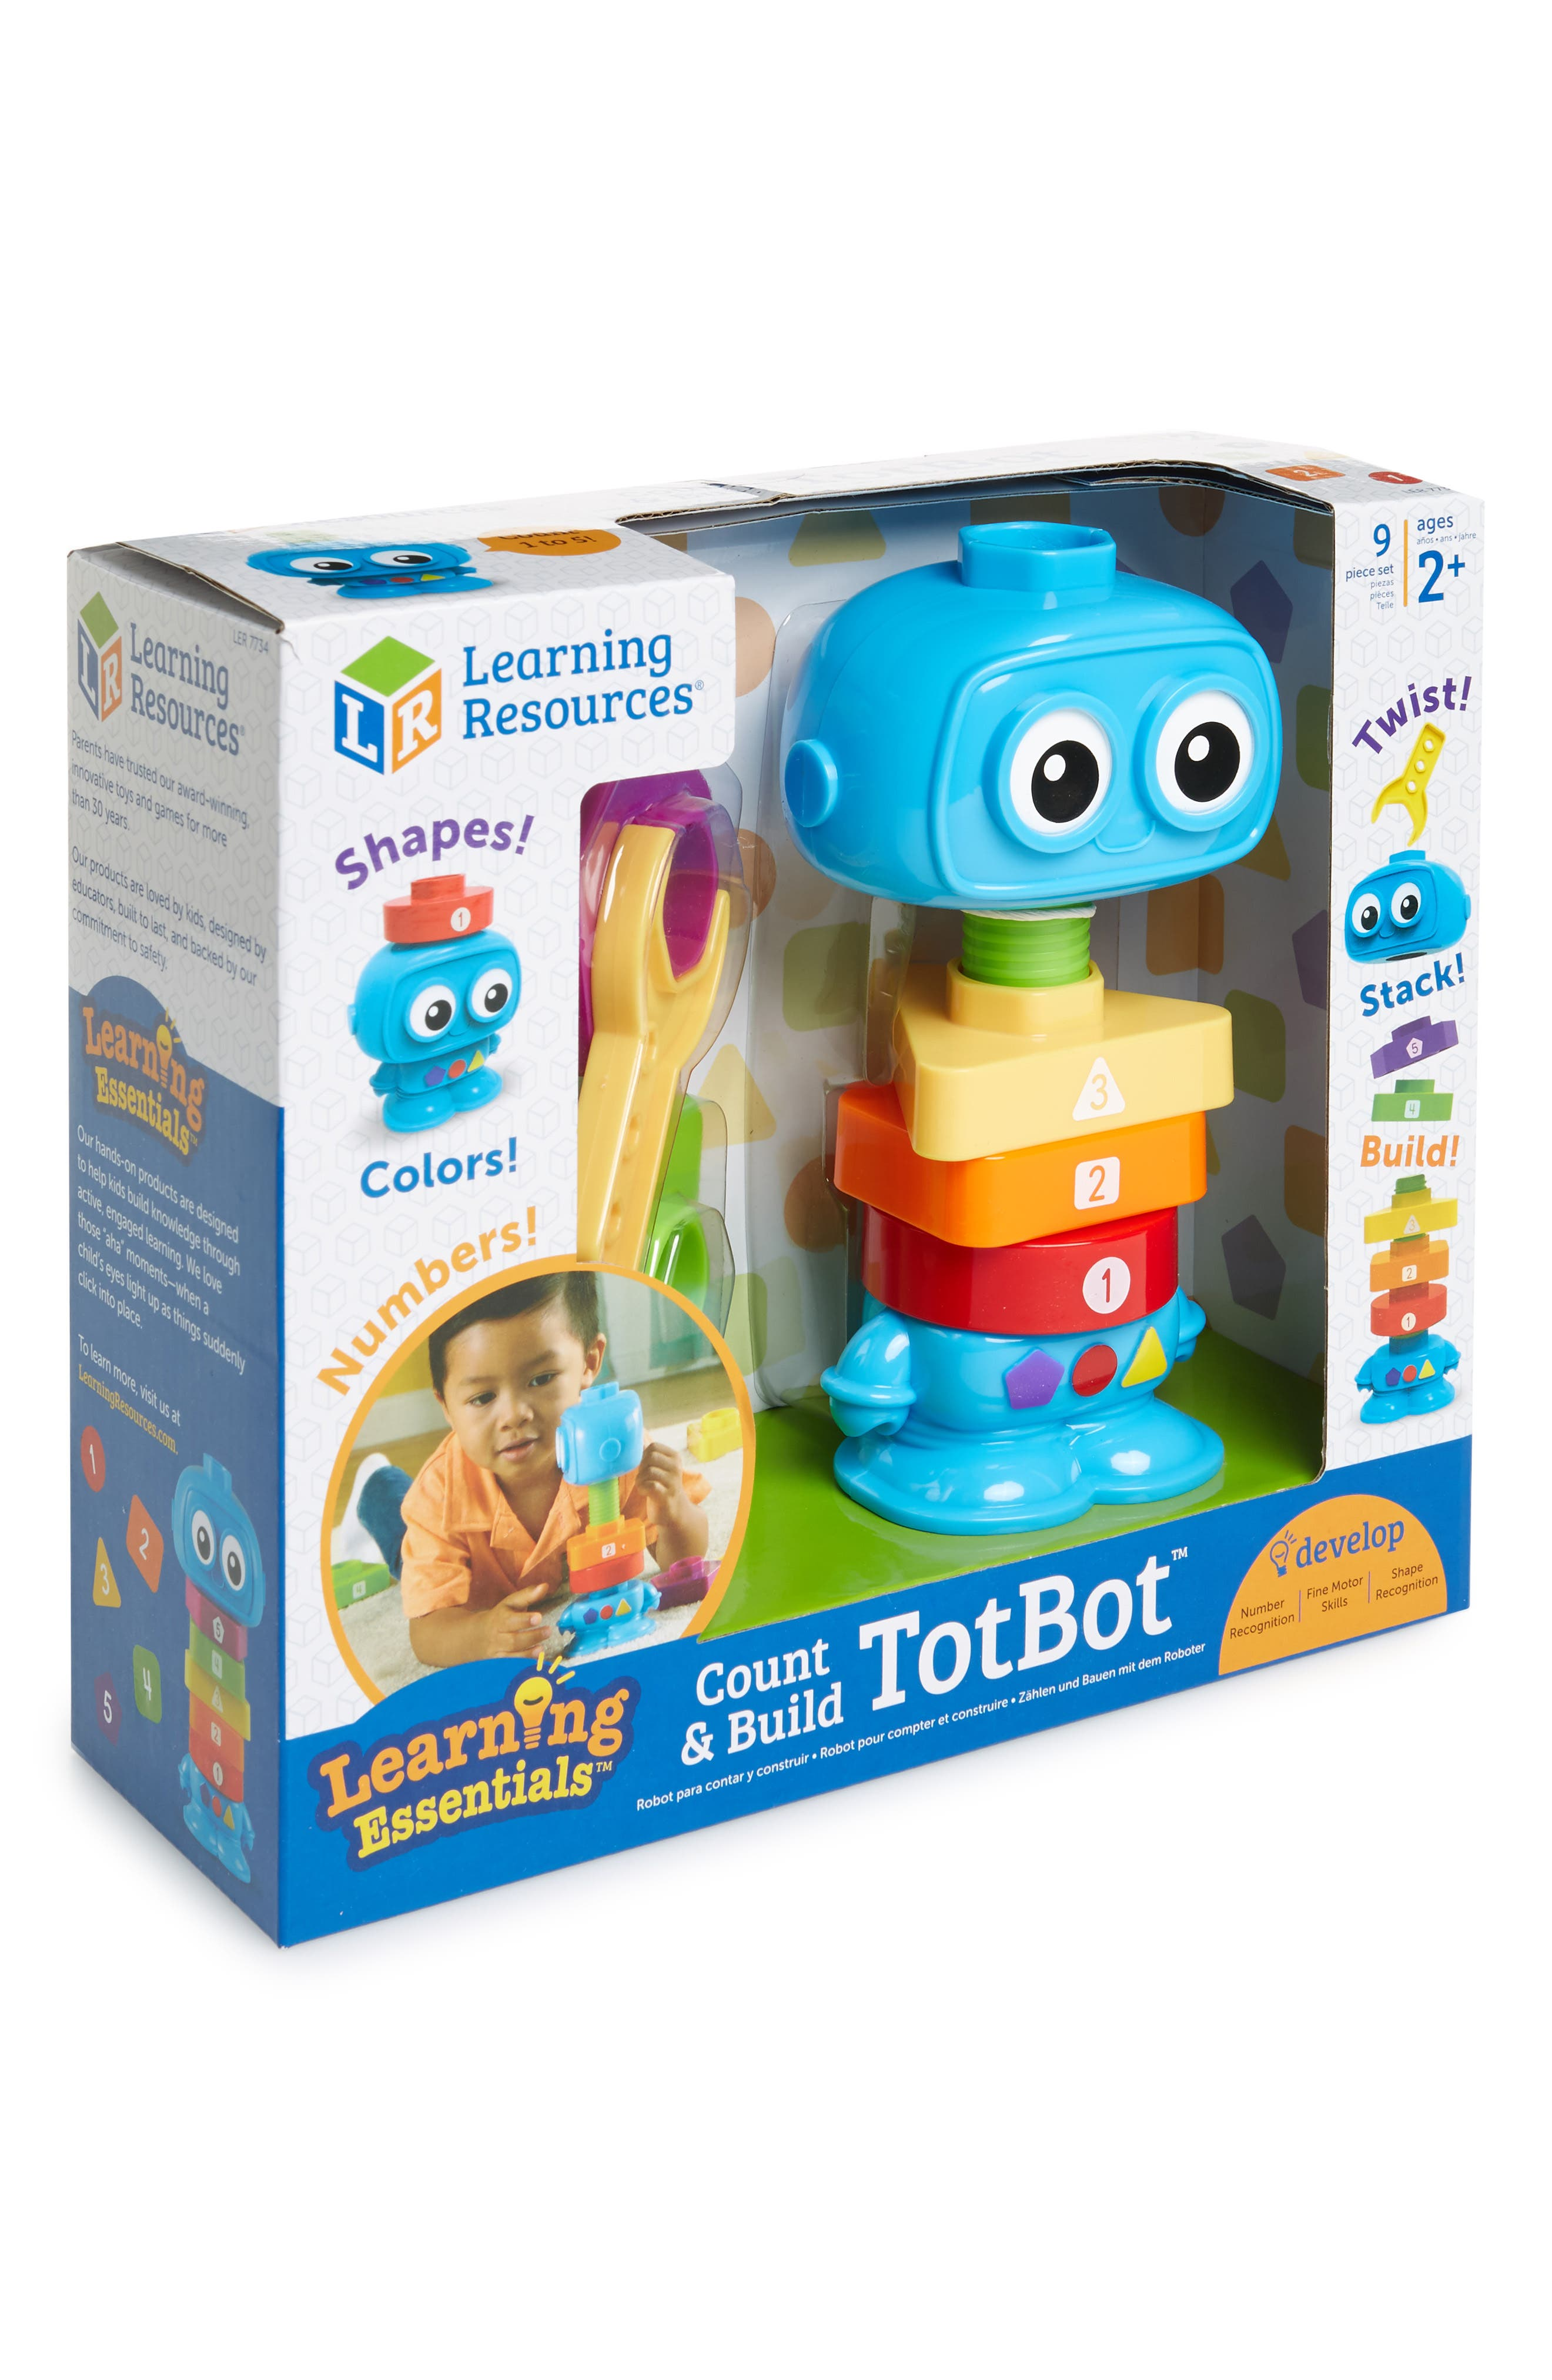 9-Piece Count & Build TotBot Toy,                             Main thumbnail 1, color,                             400